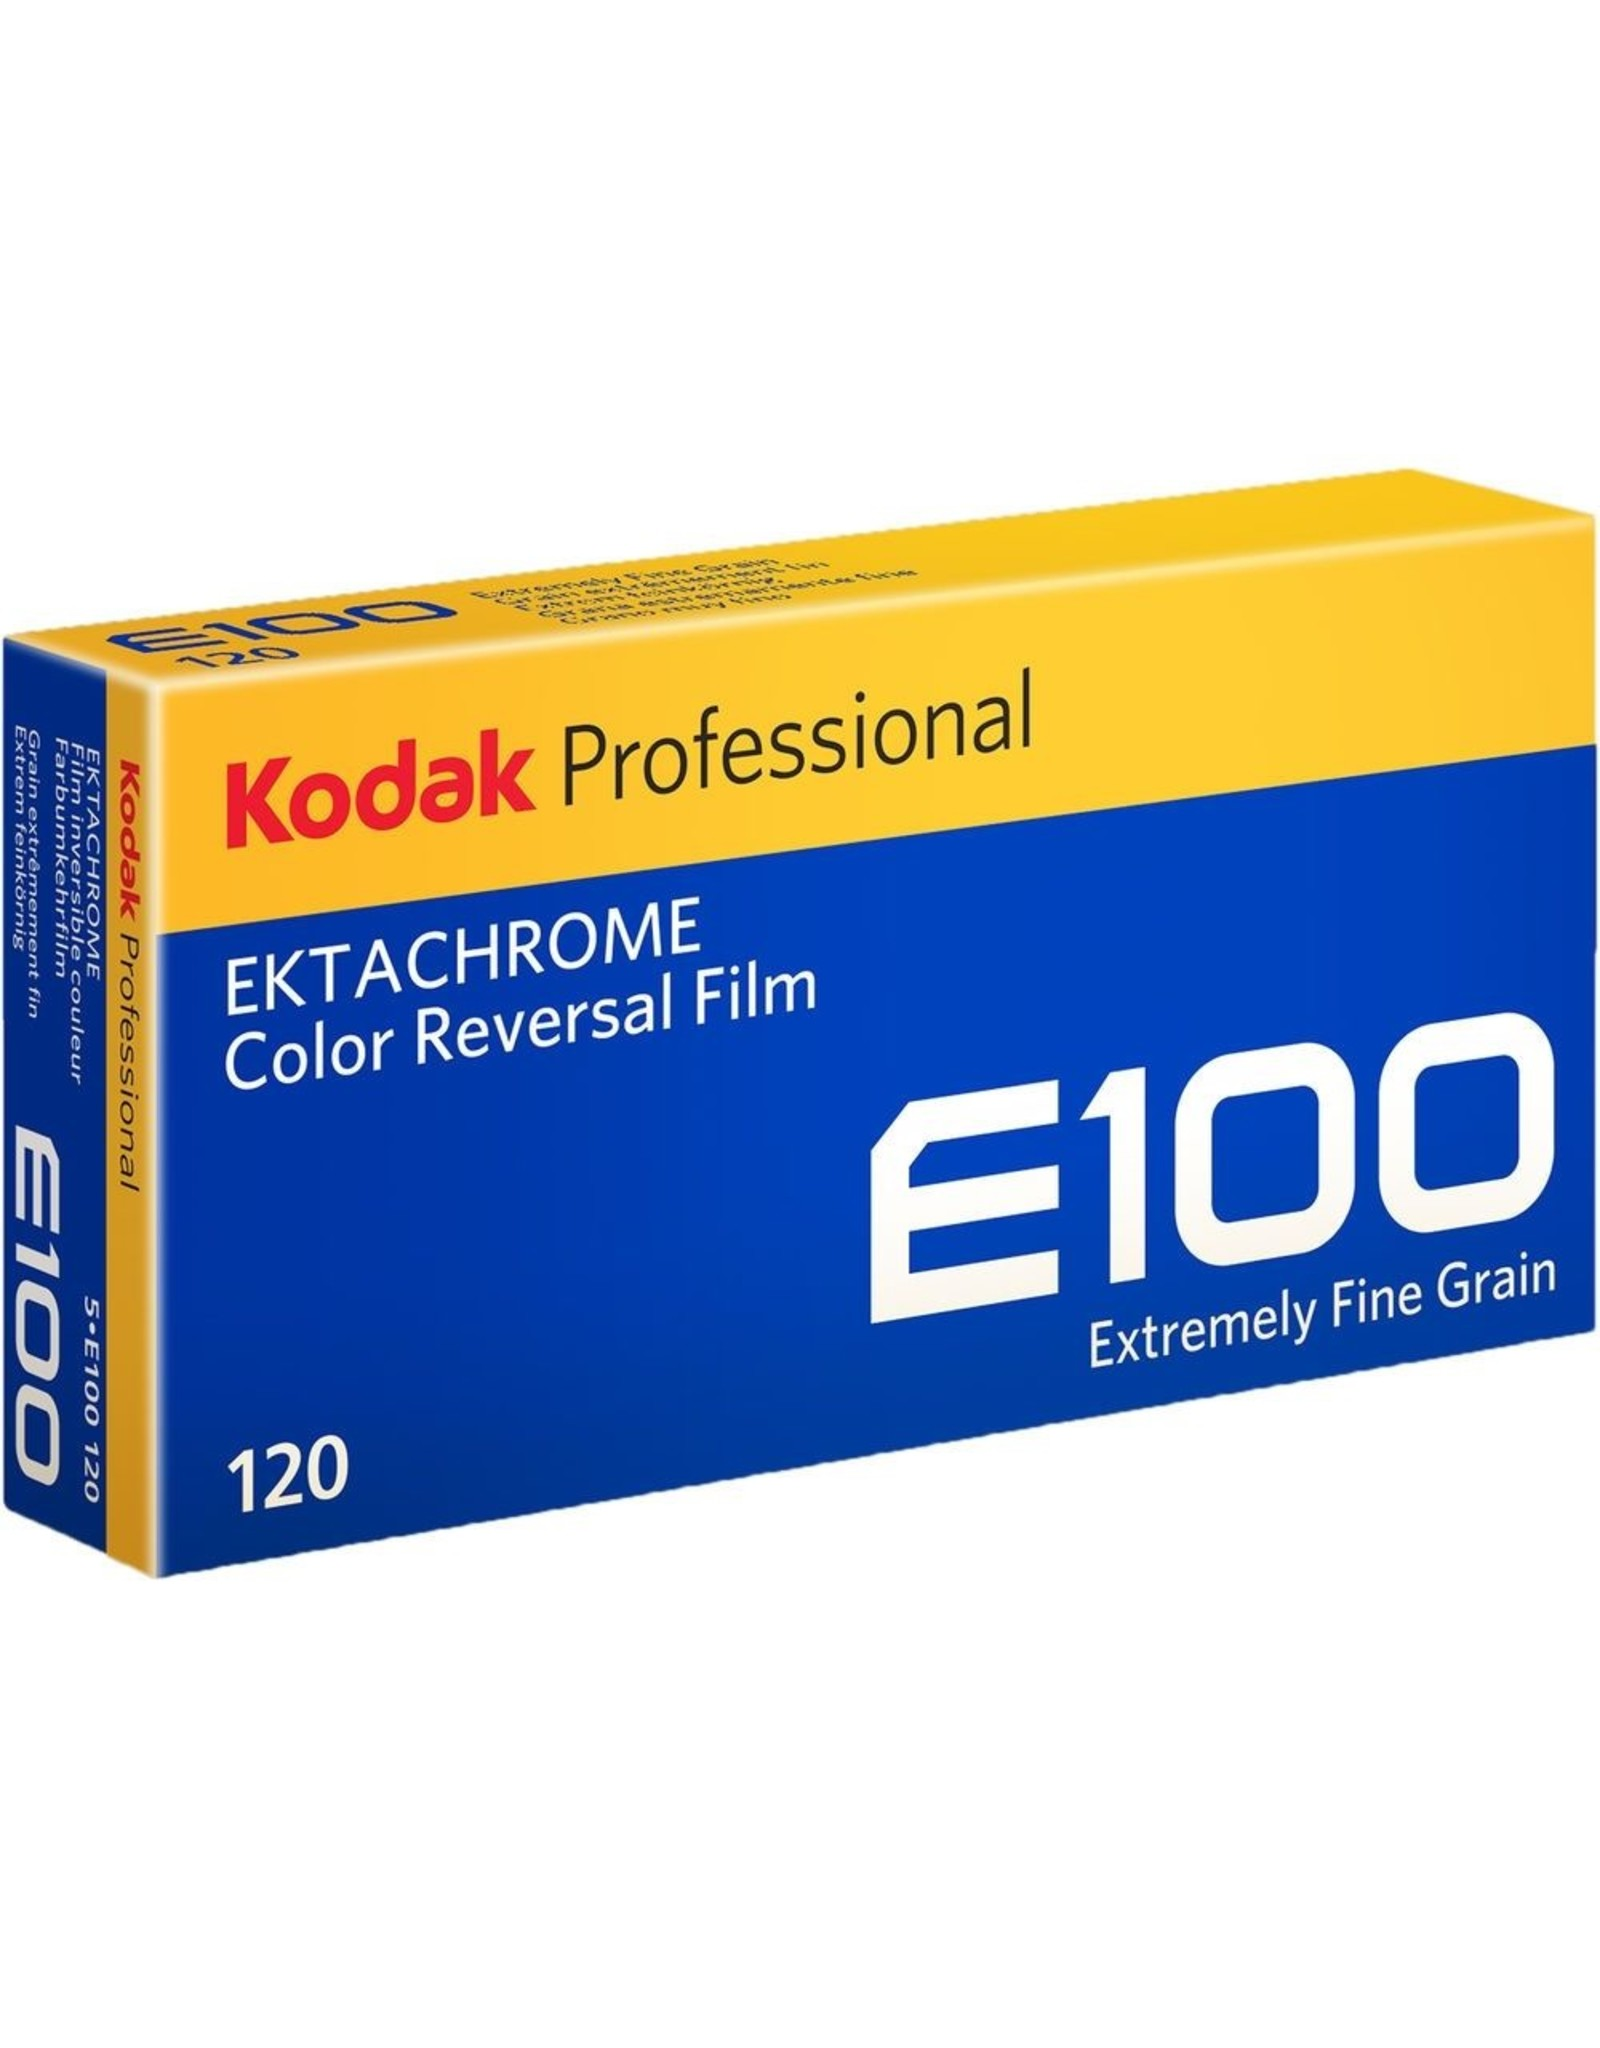 Kodak Kodak  Ektachrome  E100 (120) E6 Transparency